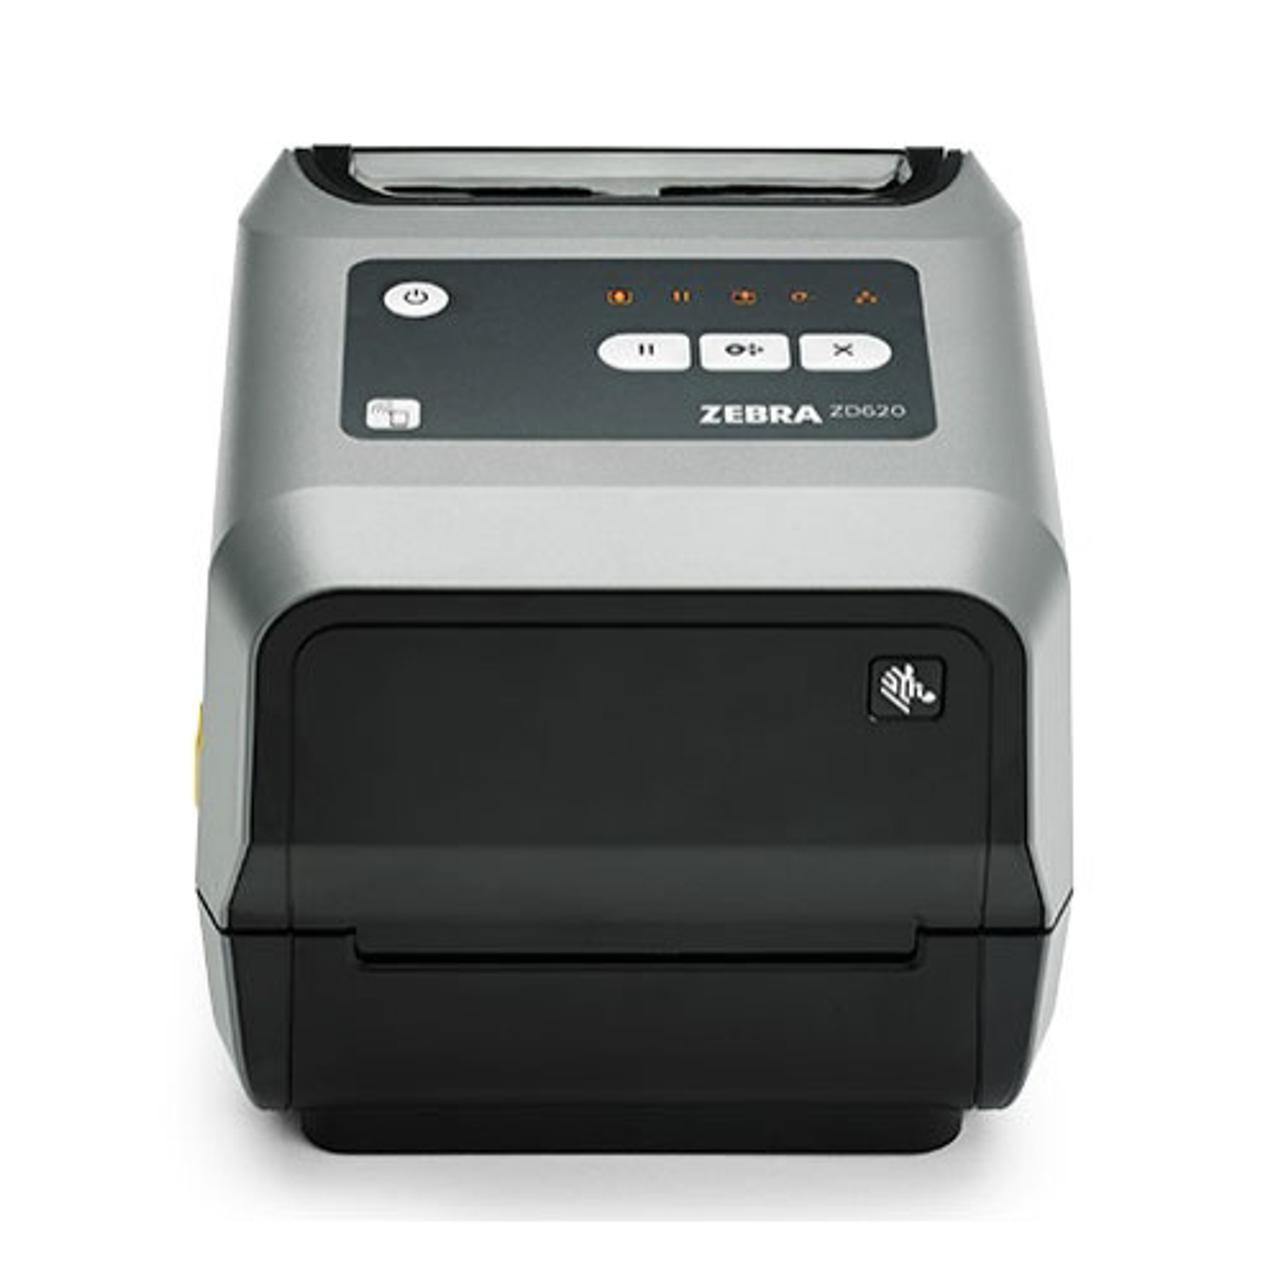 Zebra ZD620 Thermal Transfer Label Printer-Barcodes com au